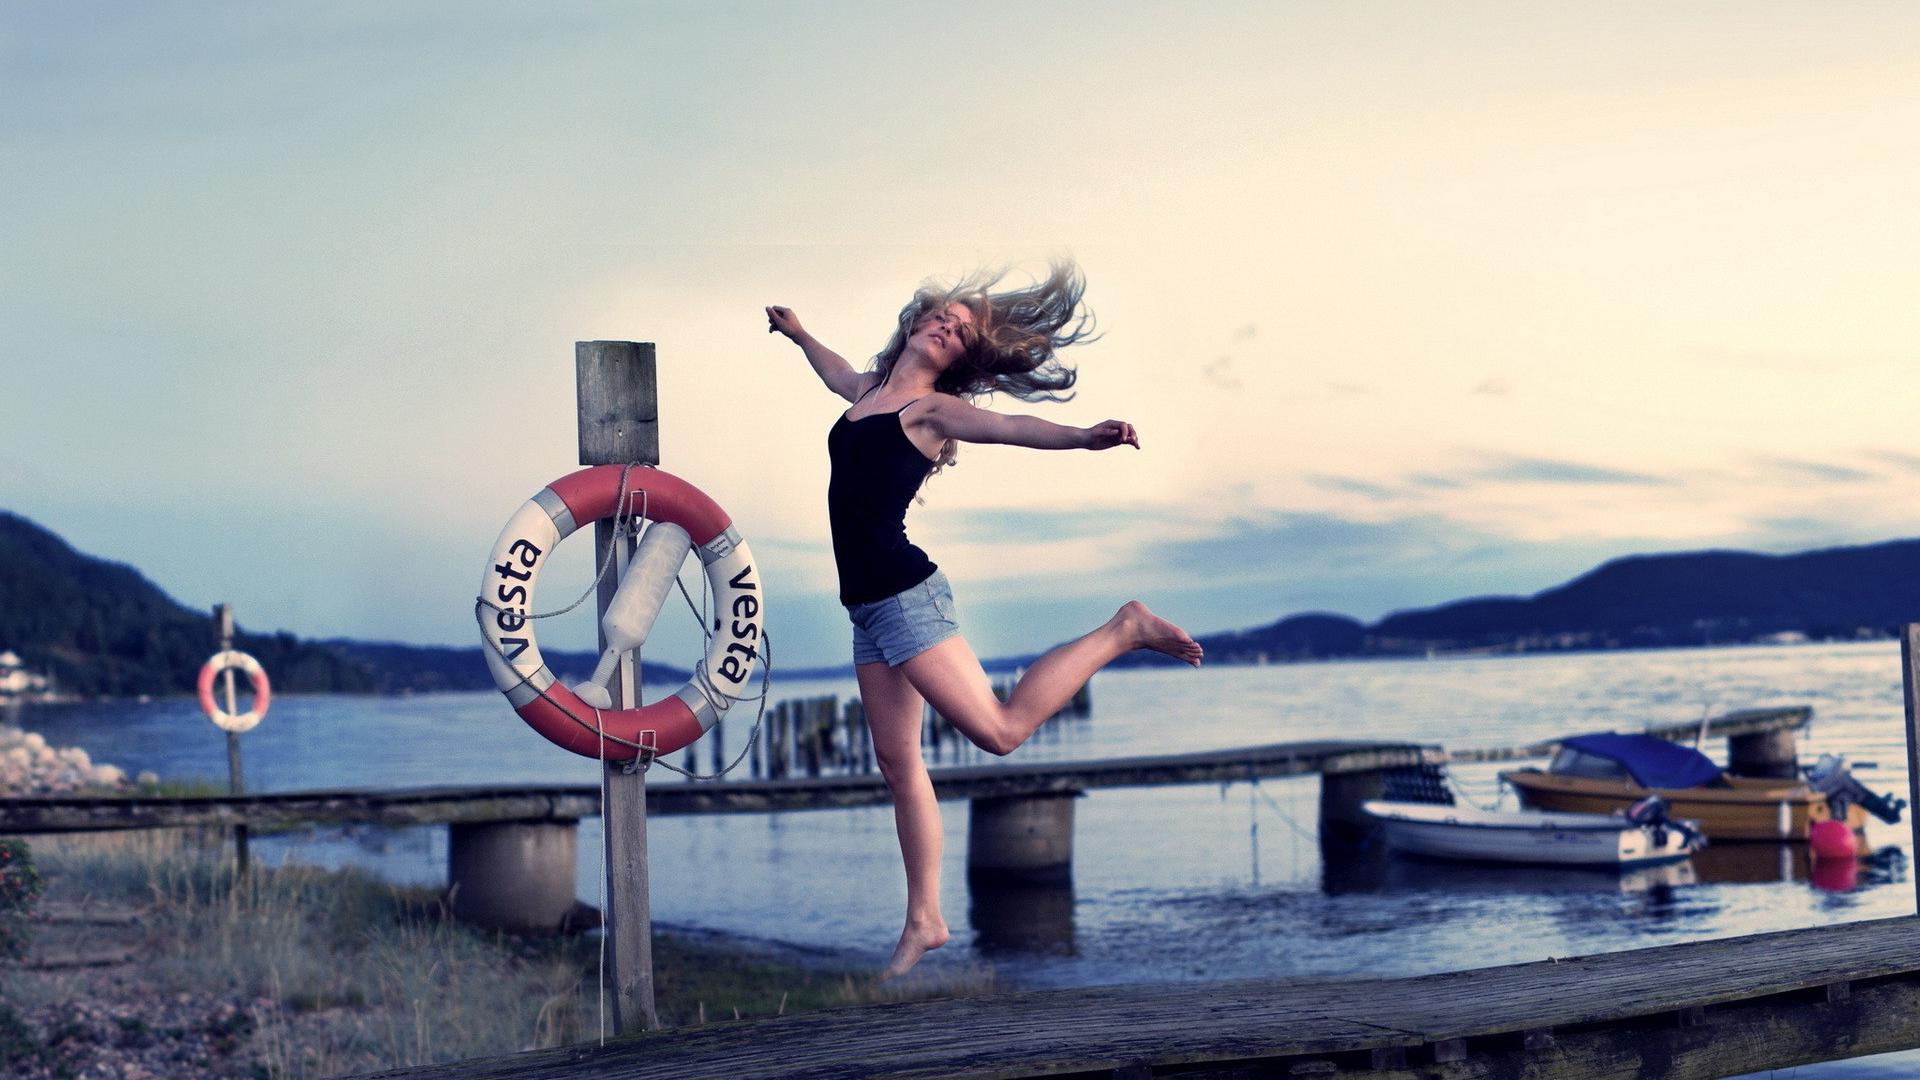 обои девушка, прыжок, шорты, пристань картинки фото